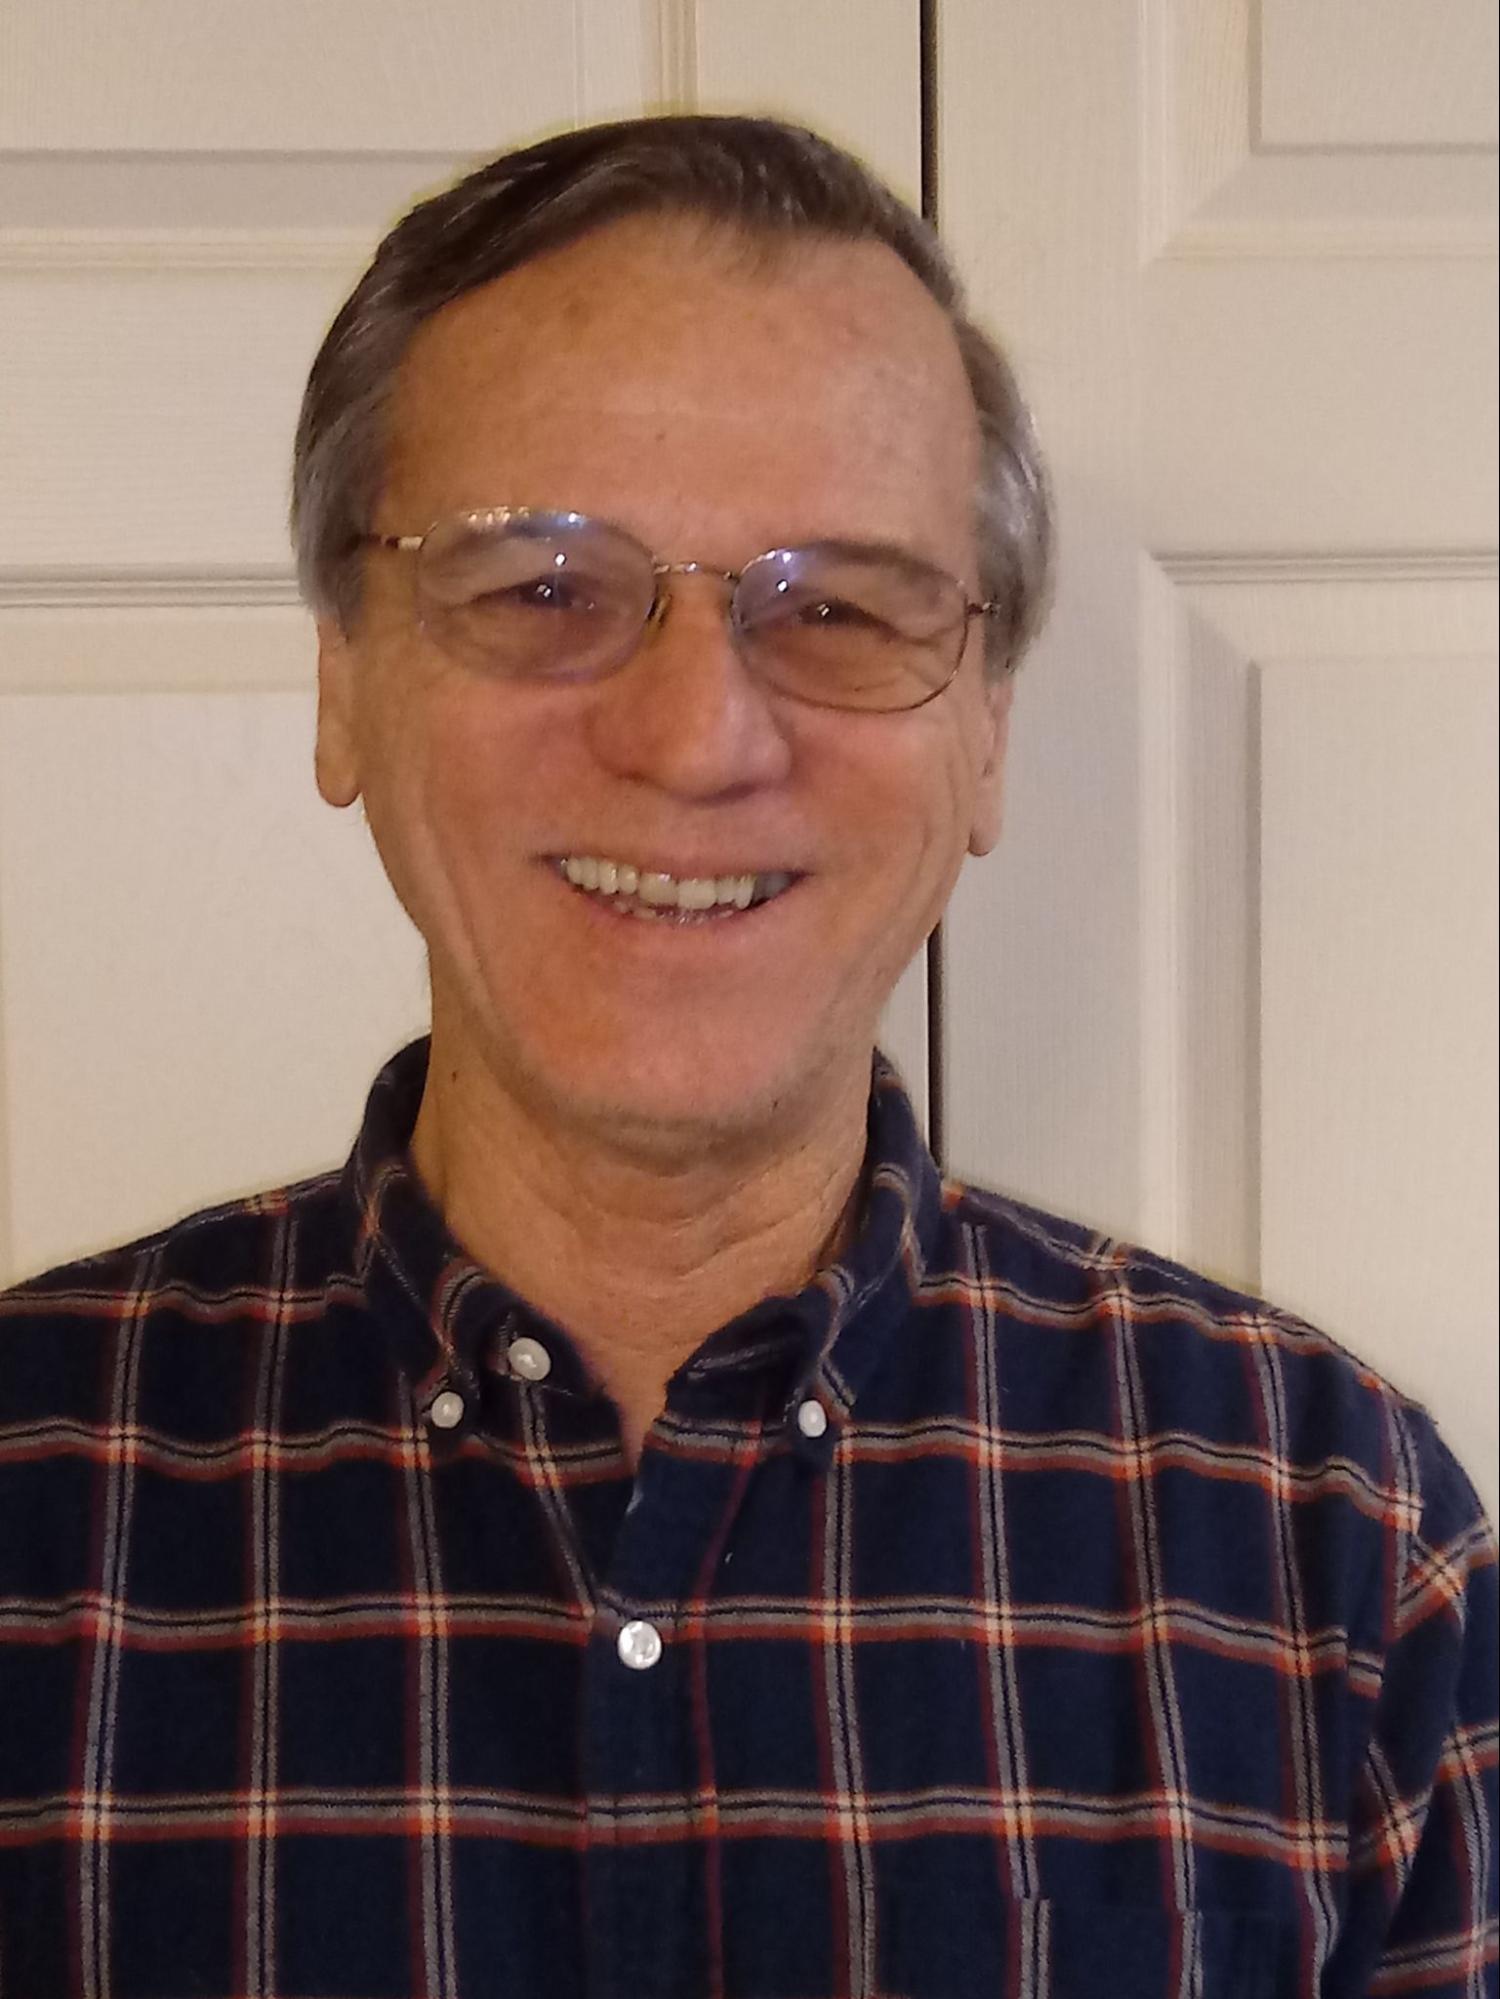 Jim Lappin